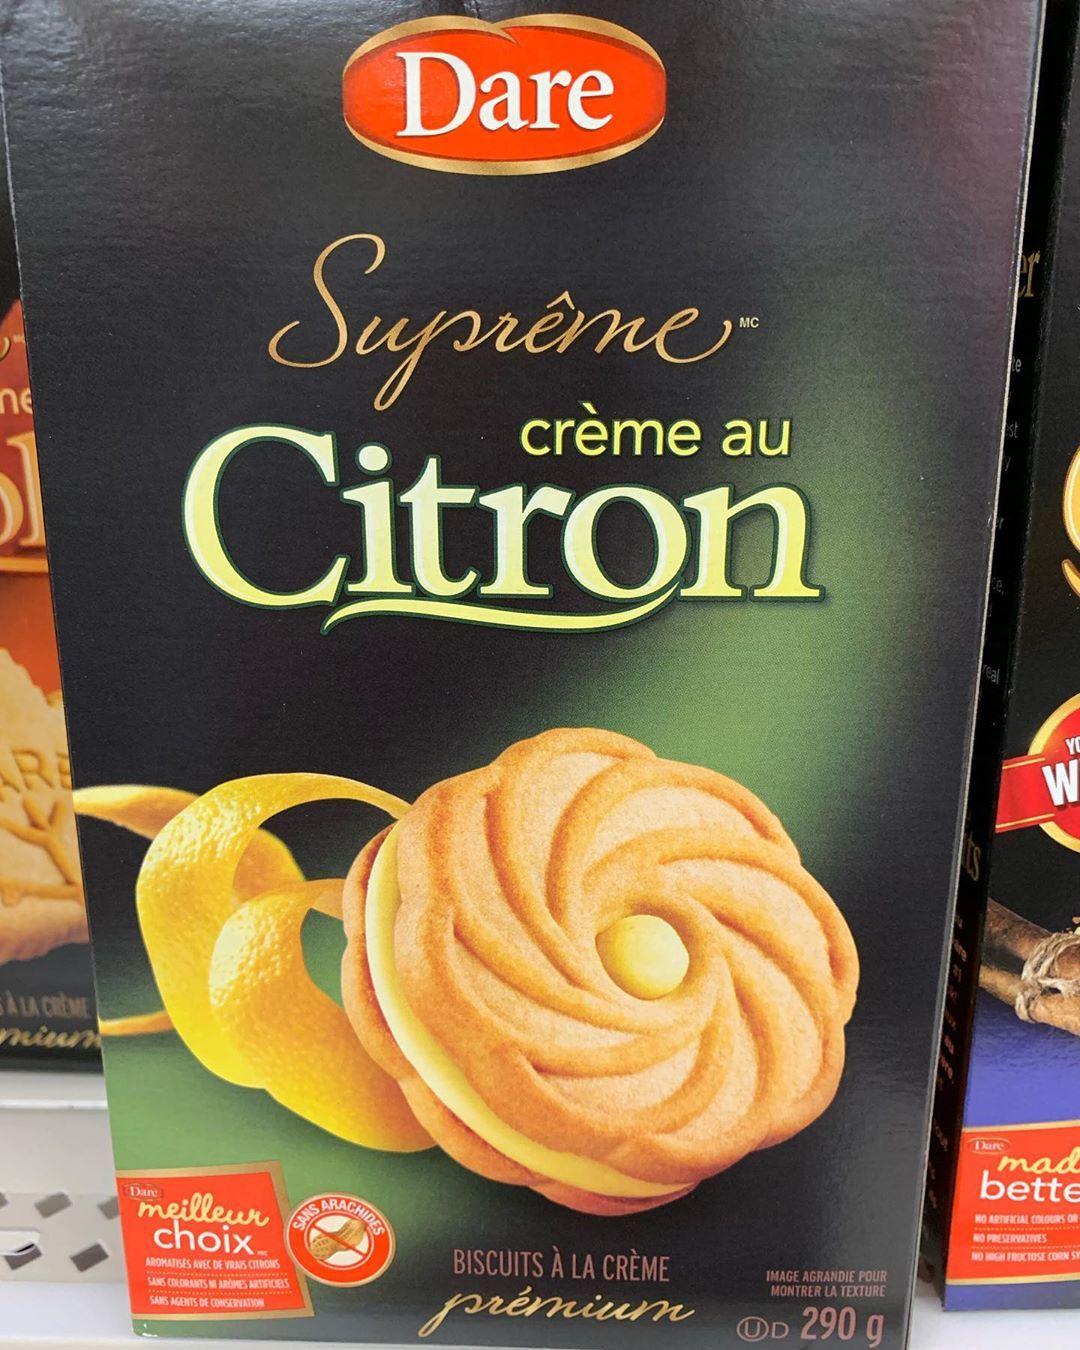 These might ACTUALLY surpass my Love for Oreos 🙊🙊. . . #fitness #lemon #lemoncookies #dare #cookies #sandwichcookie #ilovecookies #cookiemonster #dieting #postshowtreats #cheatdayeats #cheatday #fit